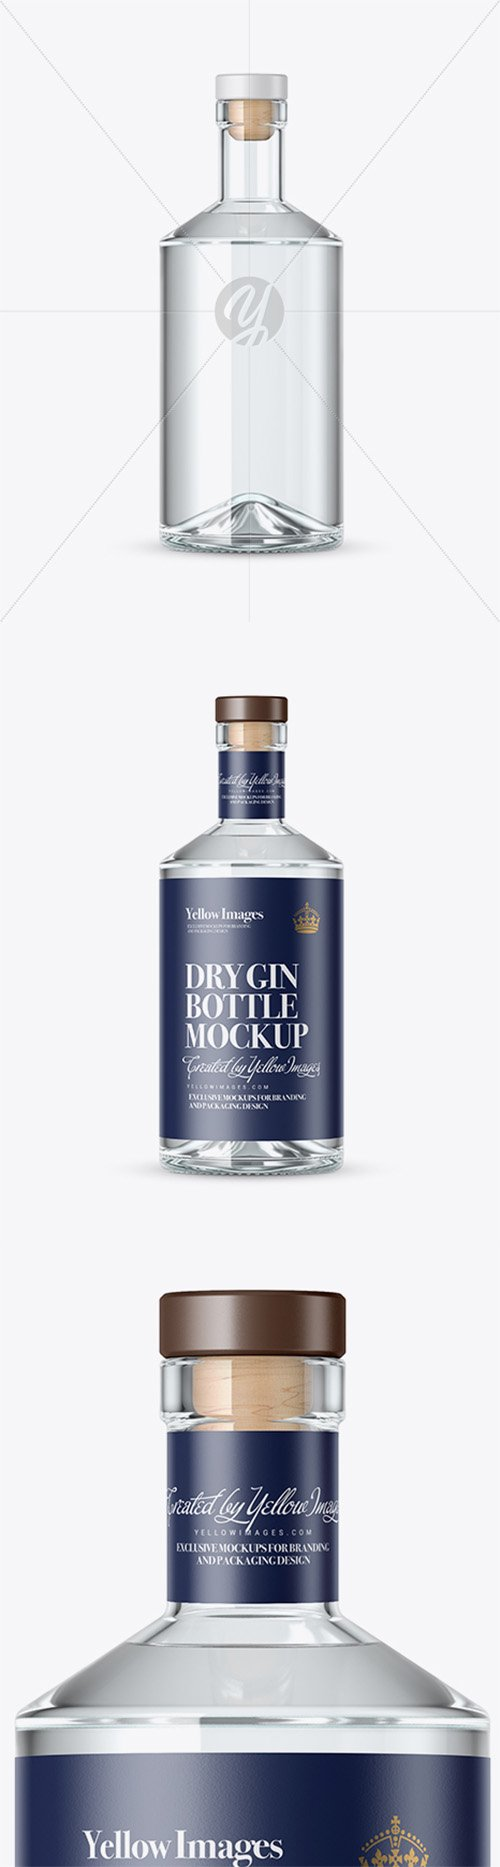 Clear Glass Gin Bottle Mockup 20503 TIF